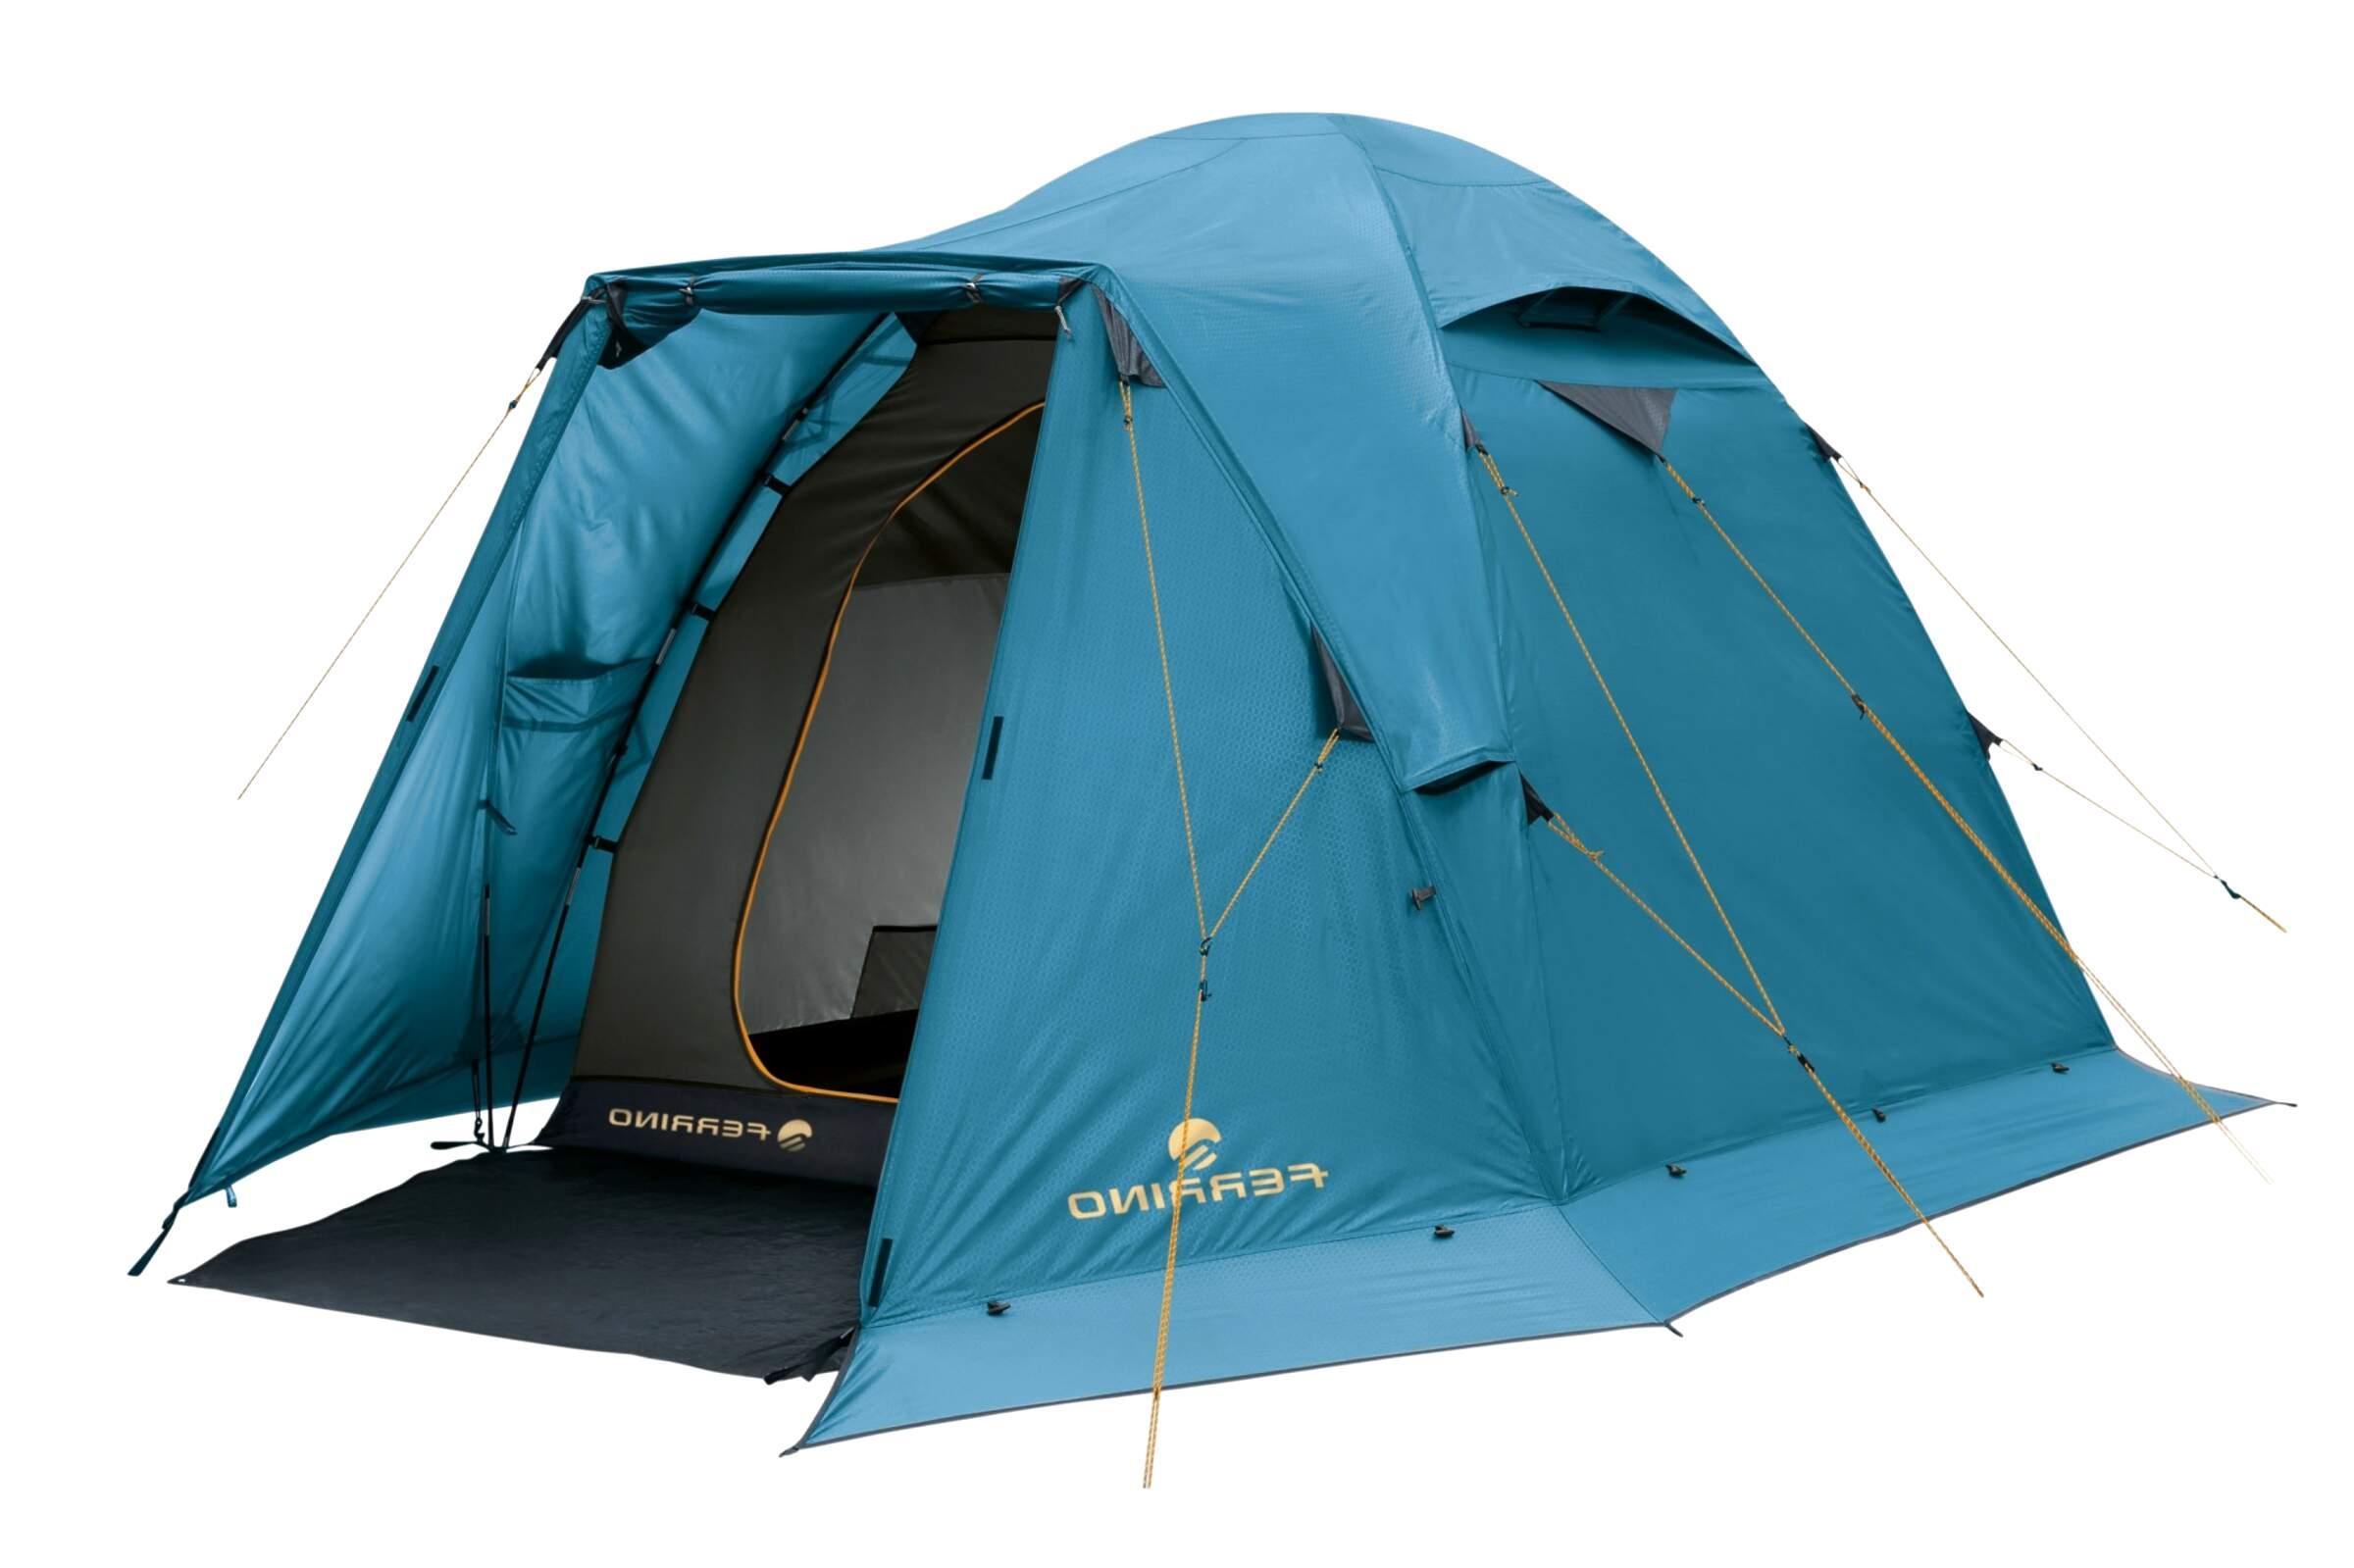 tenda 4 posti ferrino usato